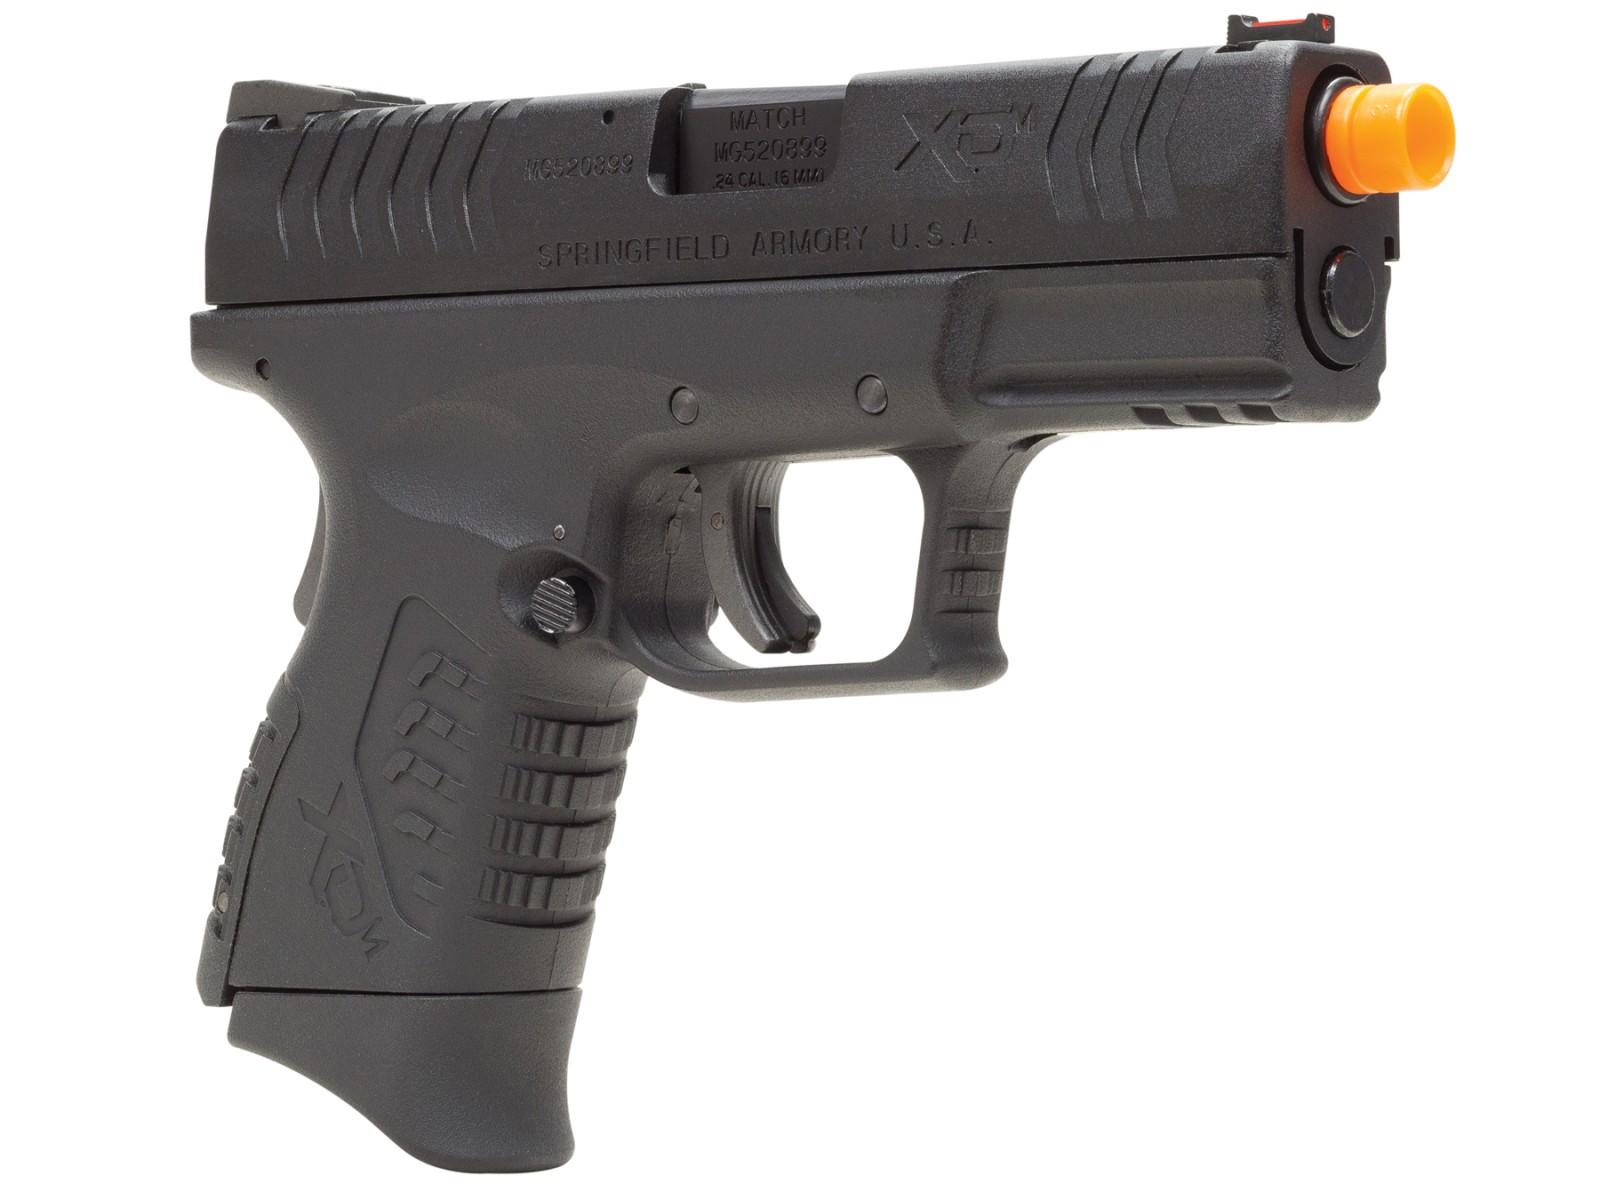 Springfield_Armory_XDM_38_GBB_Airsoft_Pistol_Black_6mm